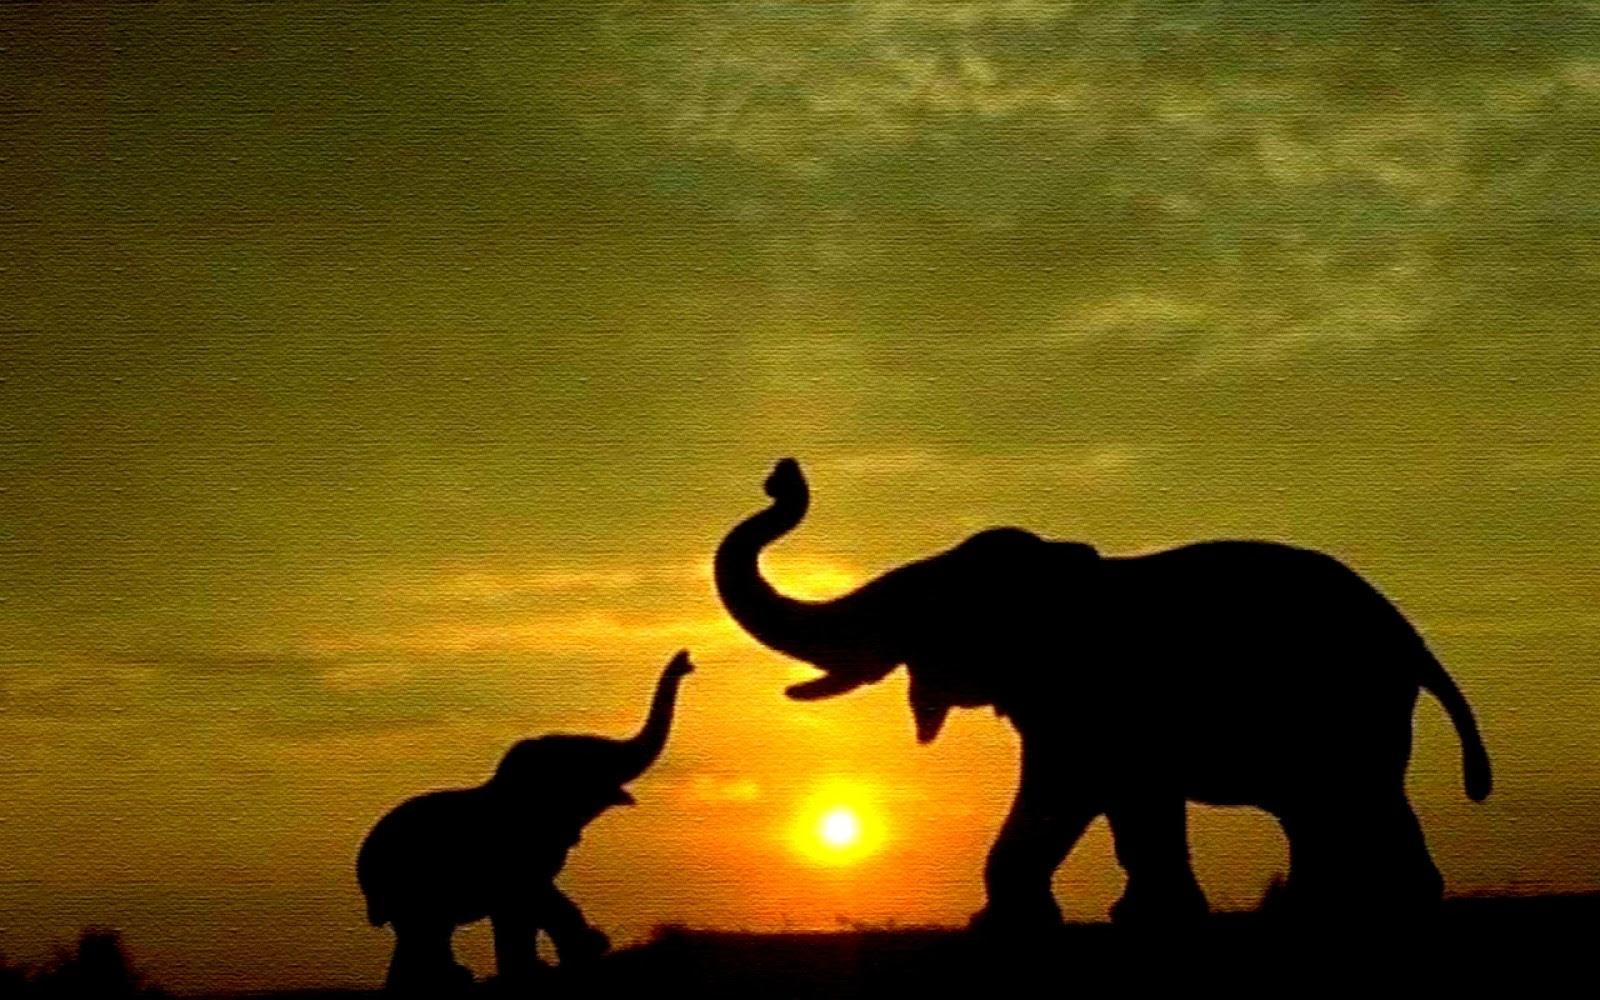 Elephant Desktop Wallpaper Wallpapers Imgur